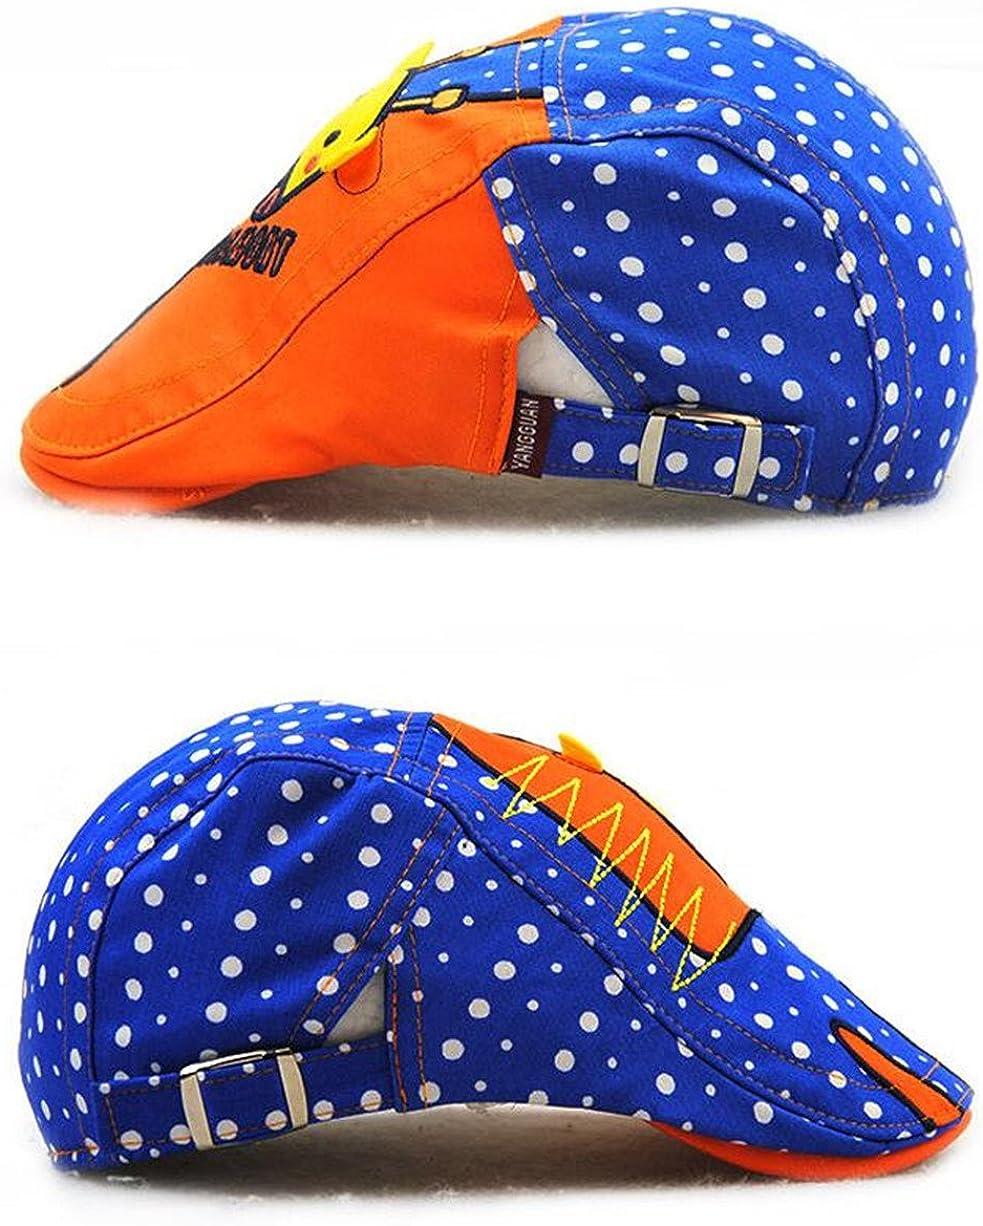 Roffatide Childs Giraffe Pattern Newsboy Cap Boys Cotton Sun Hat Girls Summer Ivy Irish Gatsby Cabbie Peaked Cap Kids